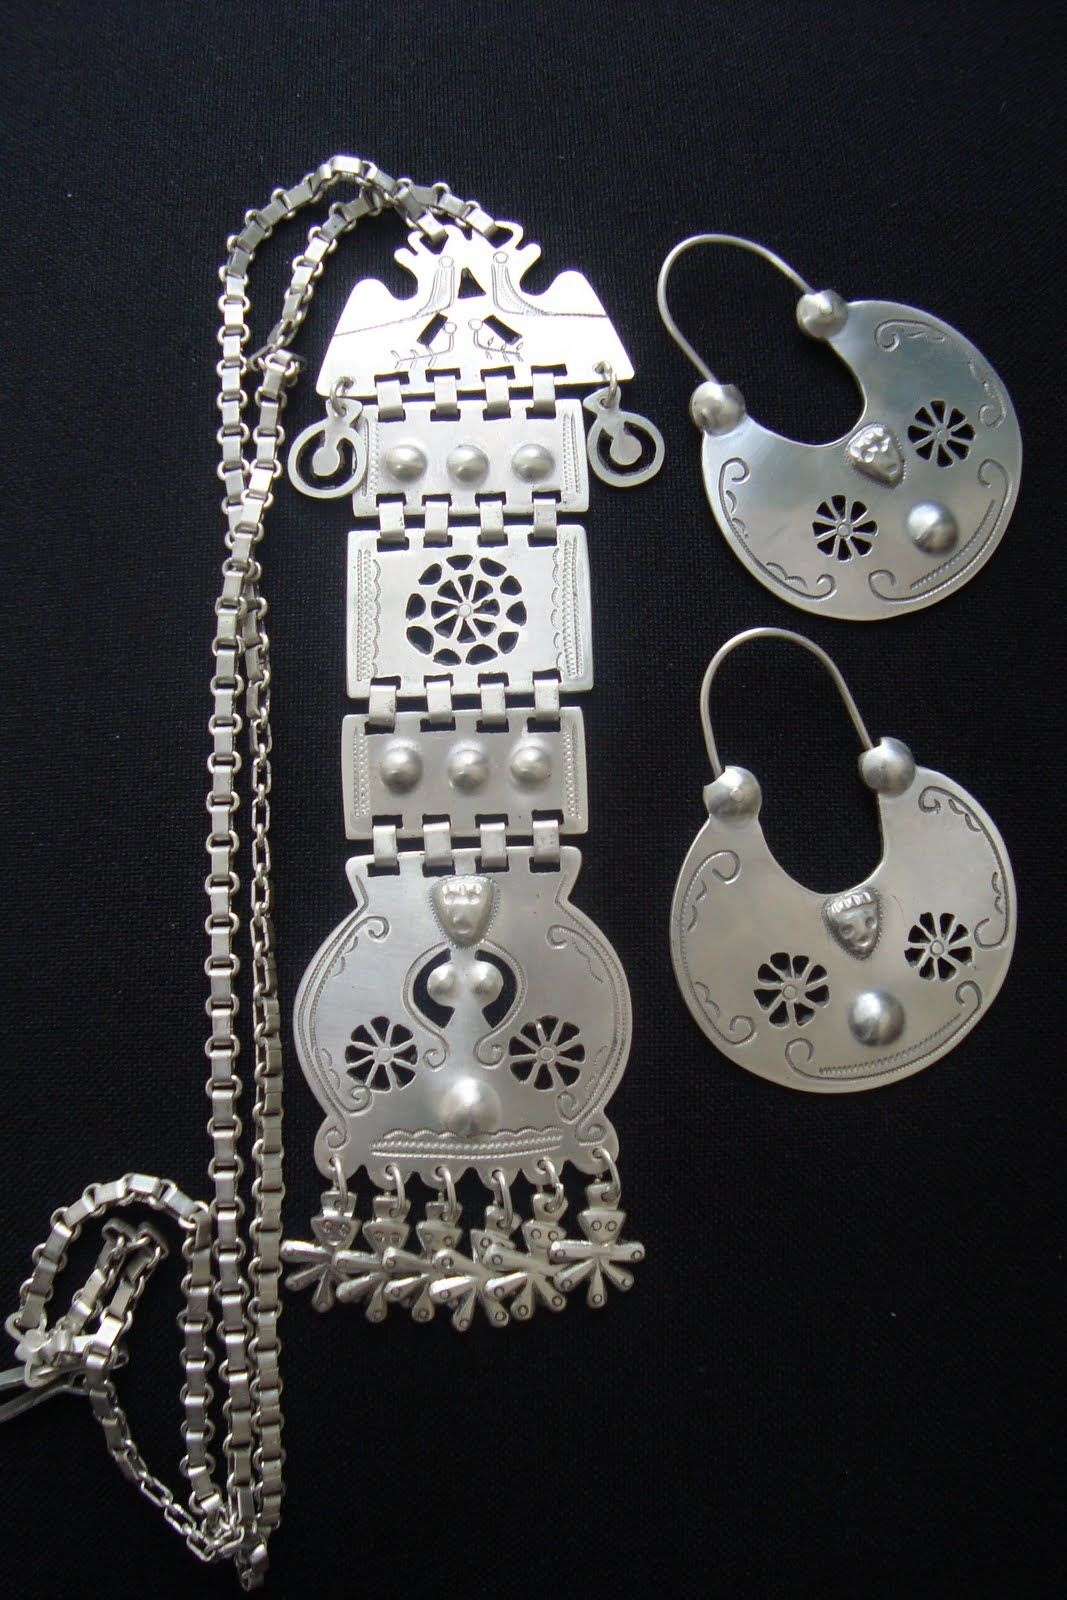 df5db2a3cfcb Mapuche jewellery Artesania Mapuche